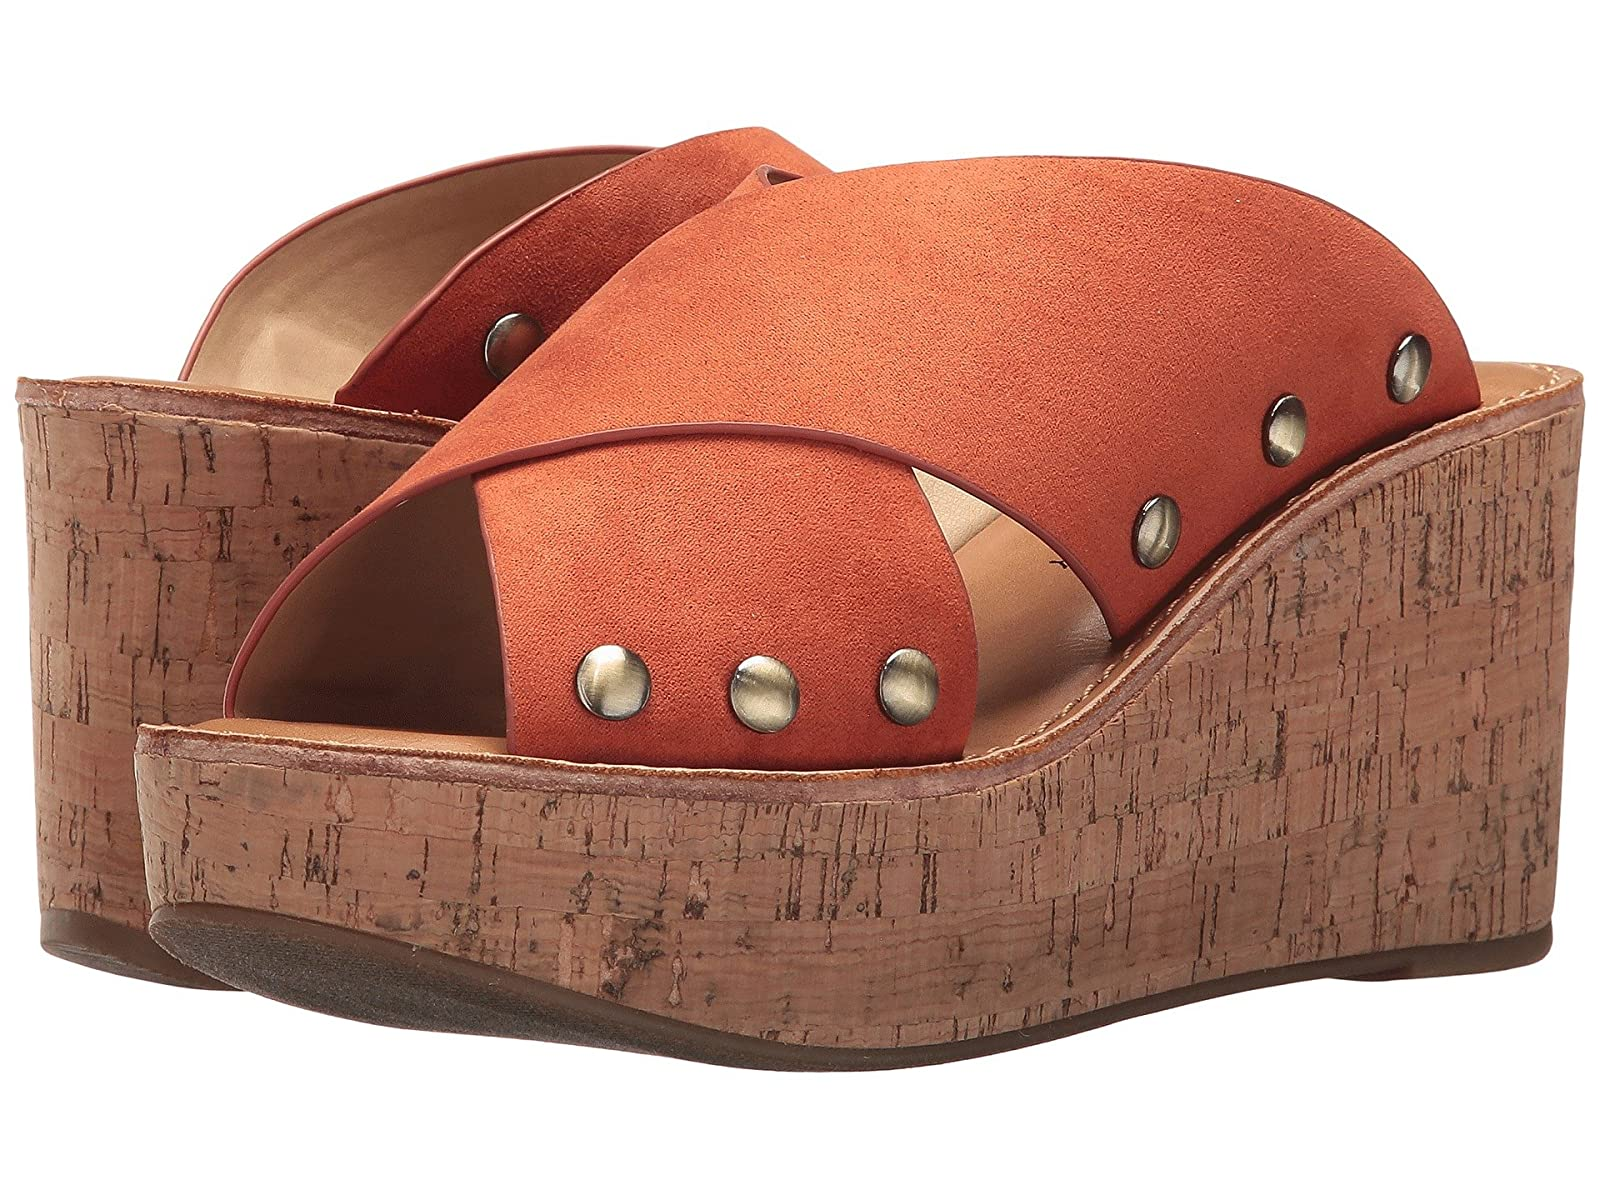 Chinese Laundry Oahu SandalAtmospheric grades have affordable shoes